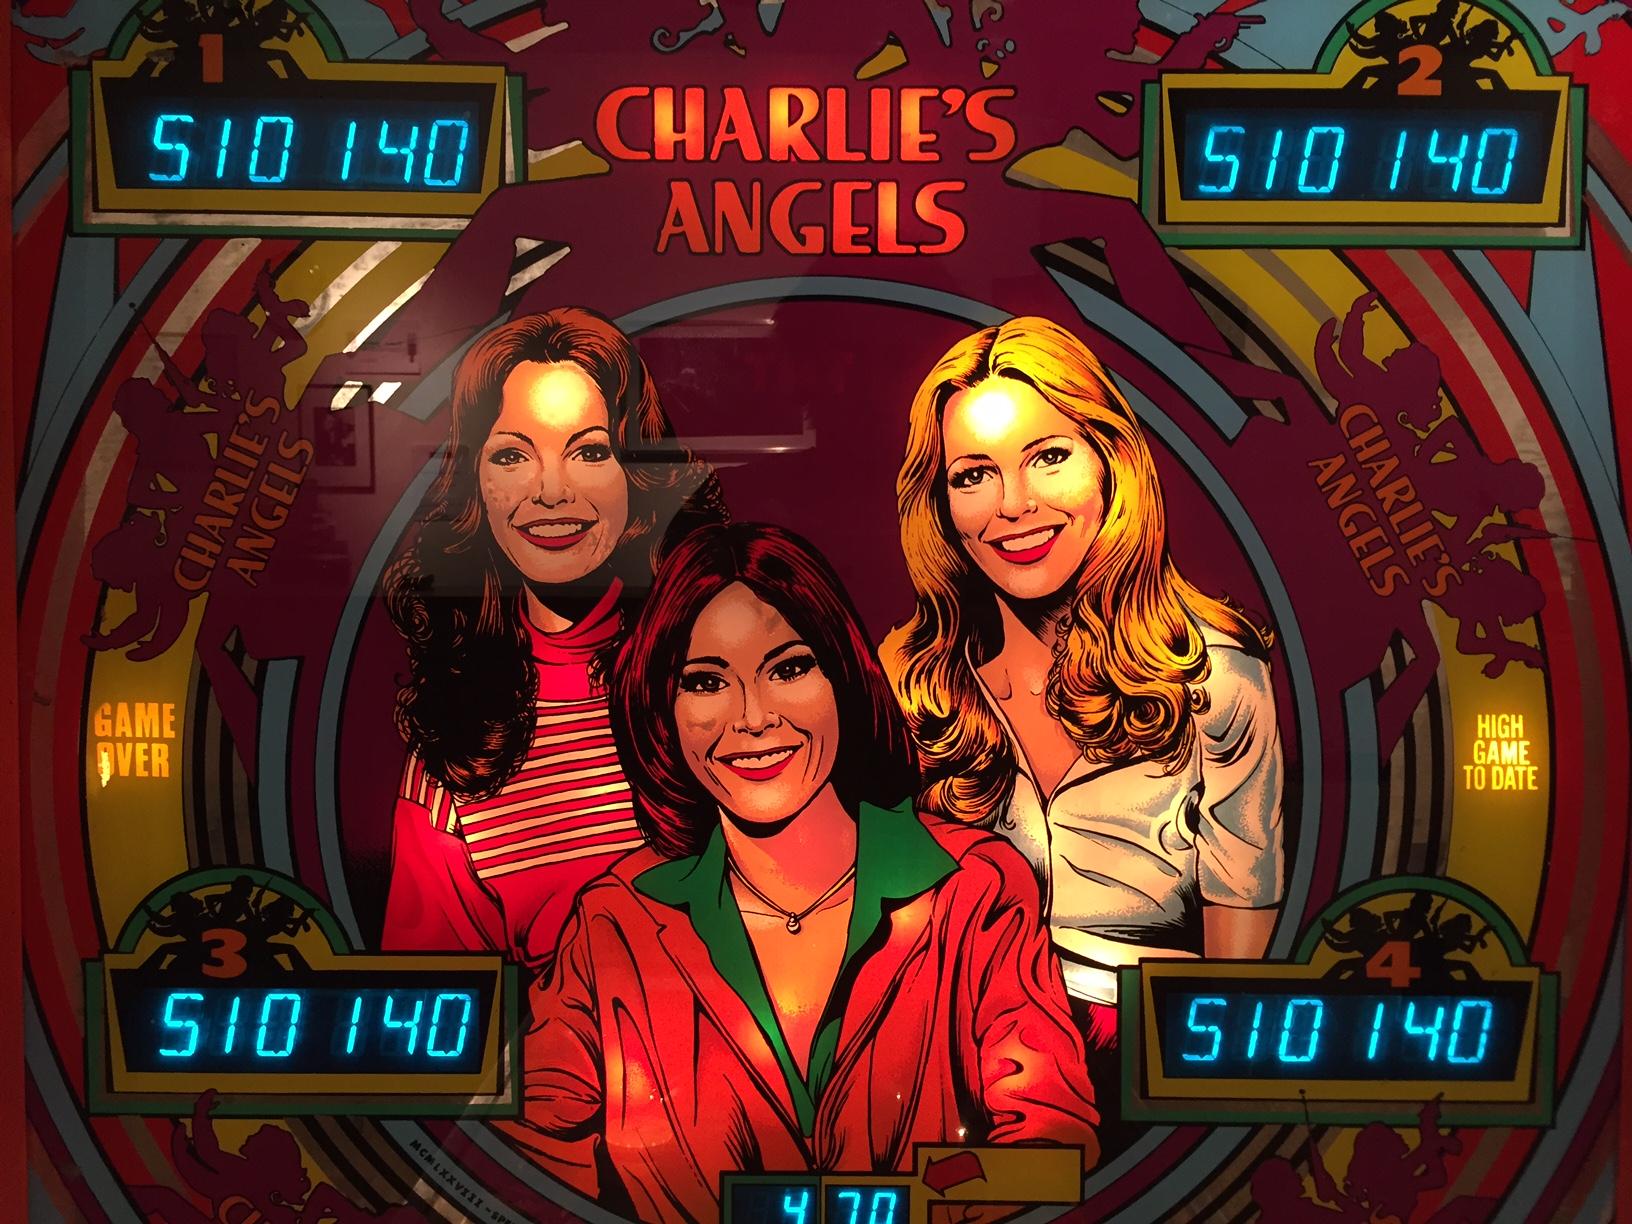 Flipper Charlie's Angels